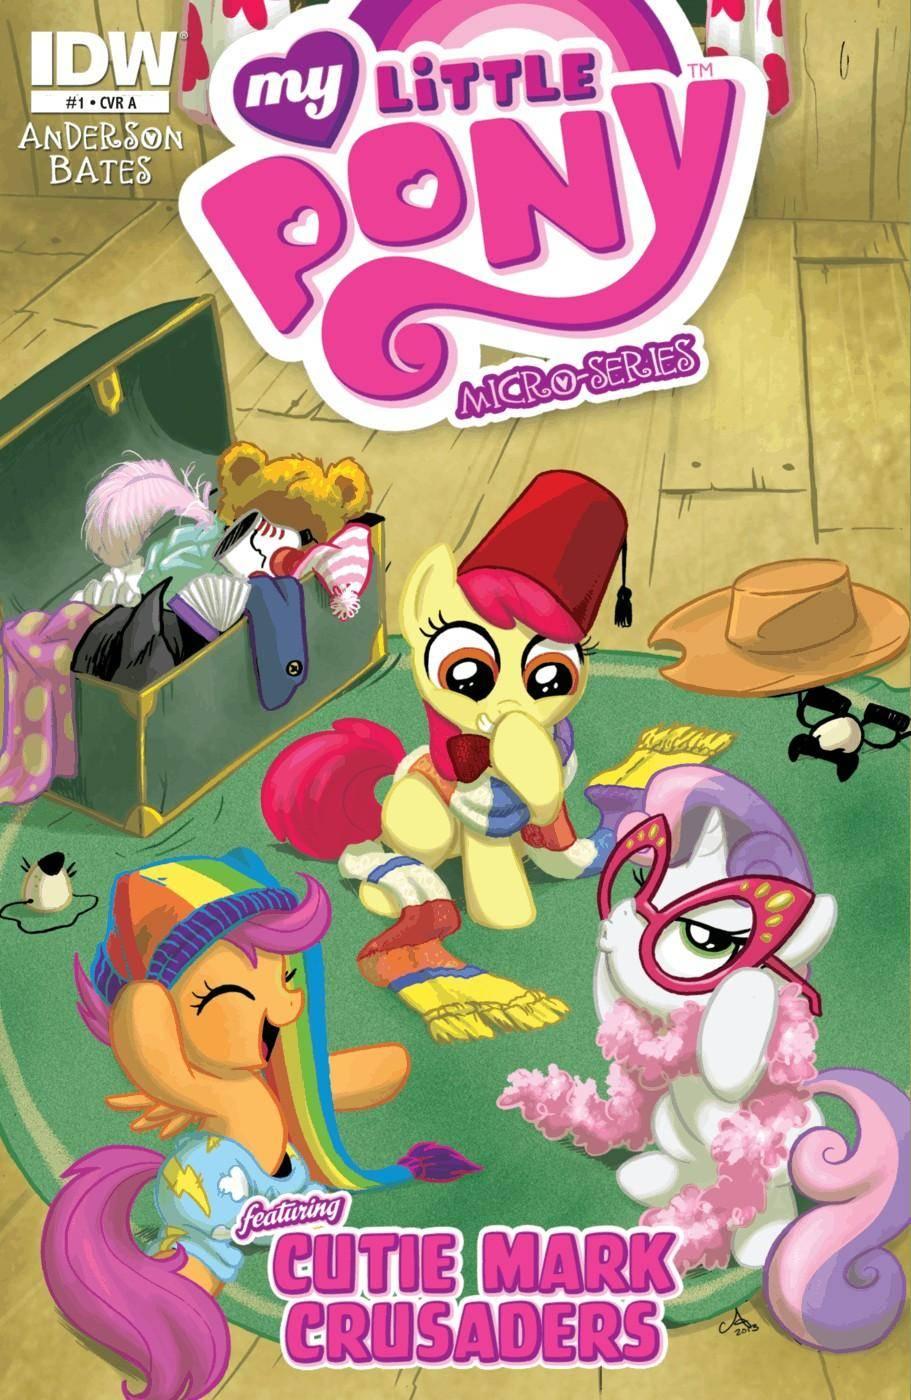 My Little Pony - Micro Series 007 Cutie Mark Crusaders 2013 2 covers digital